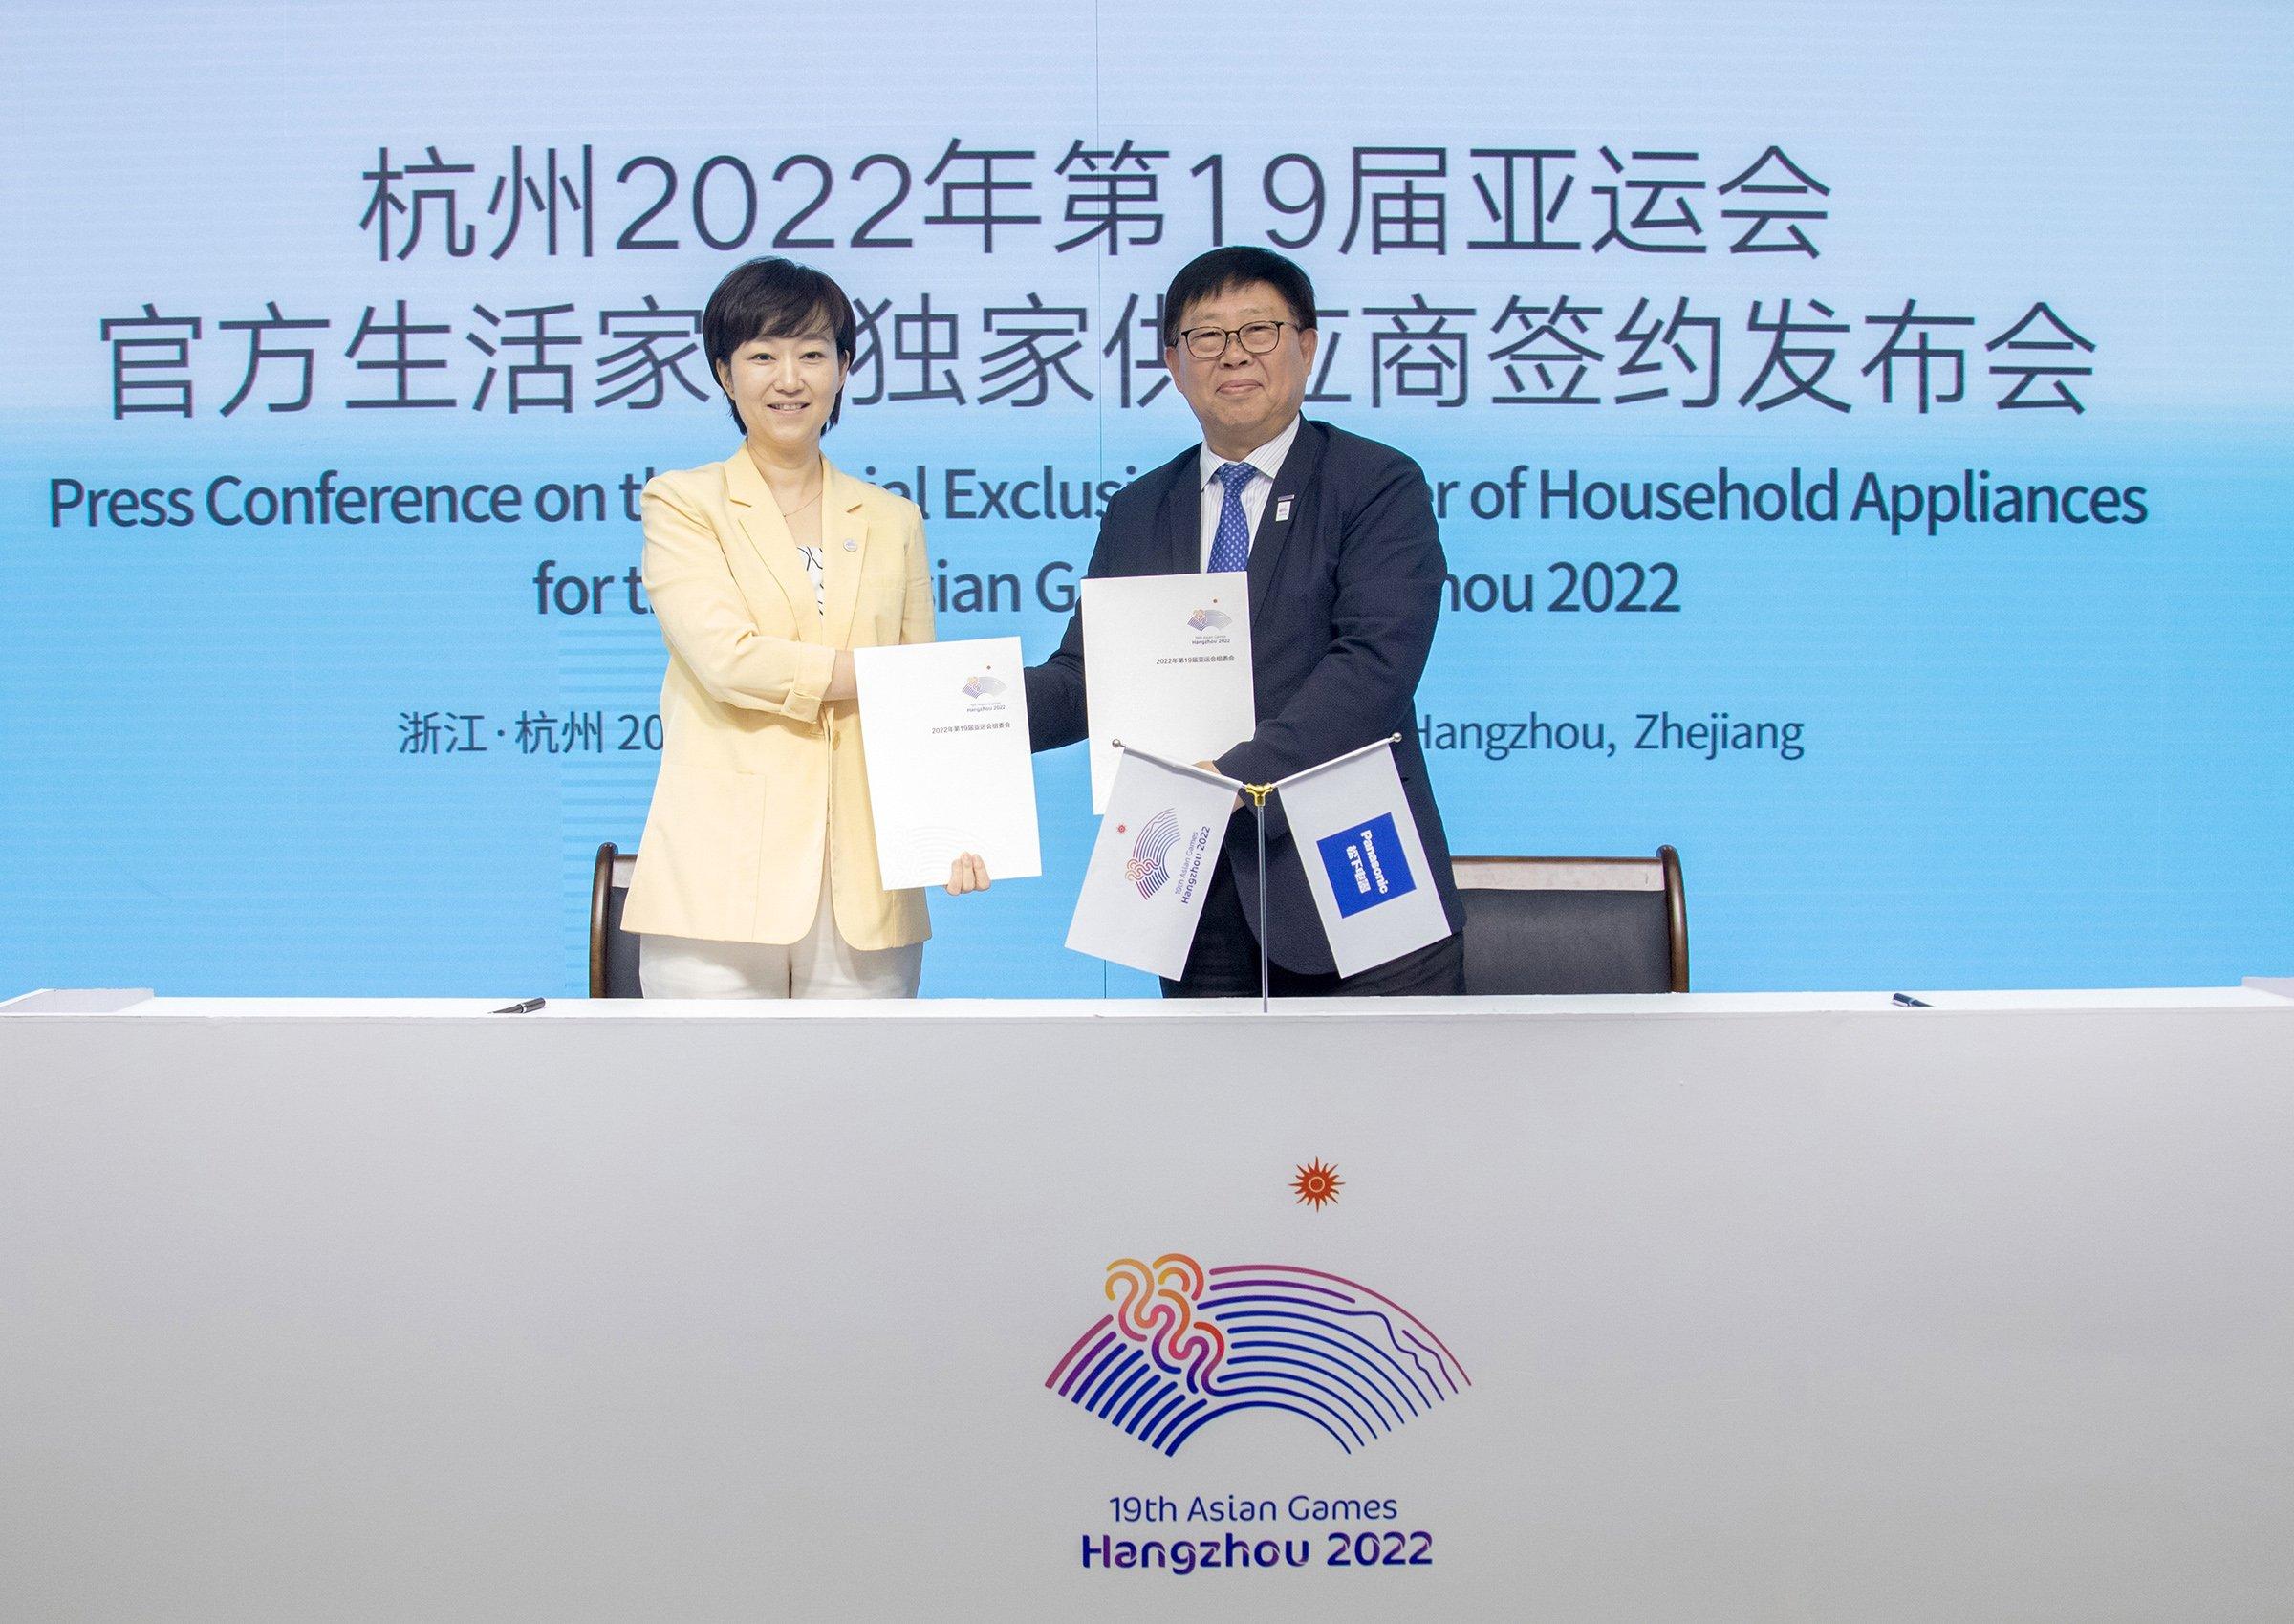 Photo: Du Mengfei, Deputy Director of Marketing Department of HAGOC, and Zhao Bingdi, President of Panasonic Corporation of China